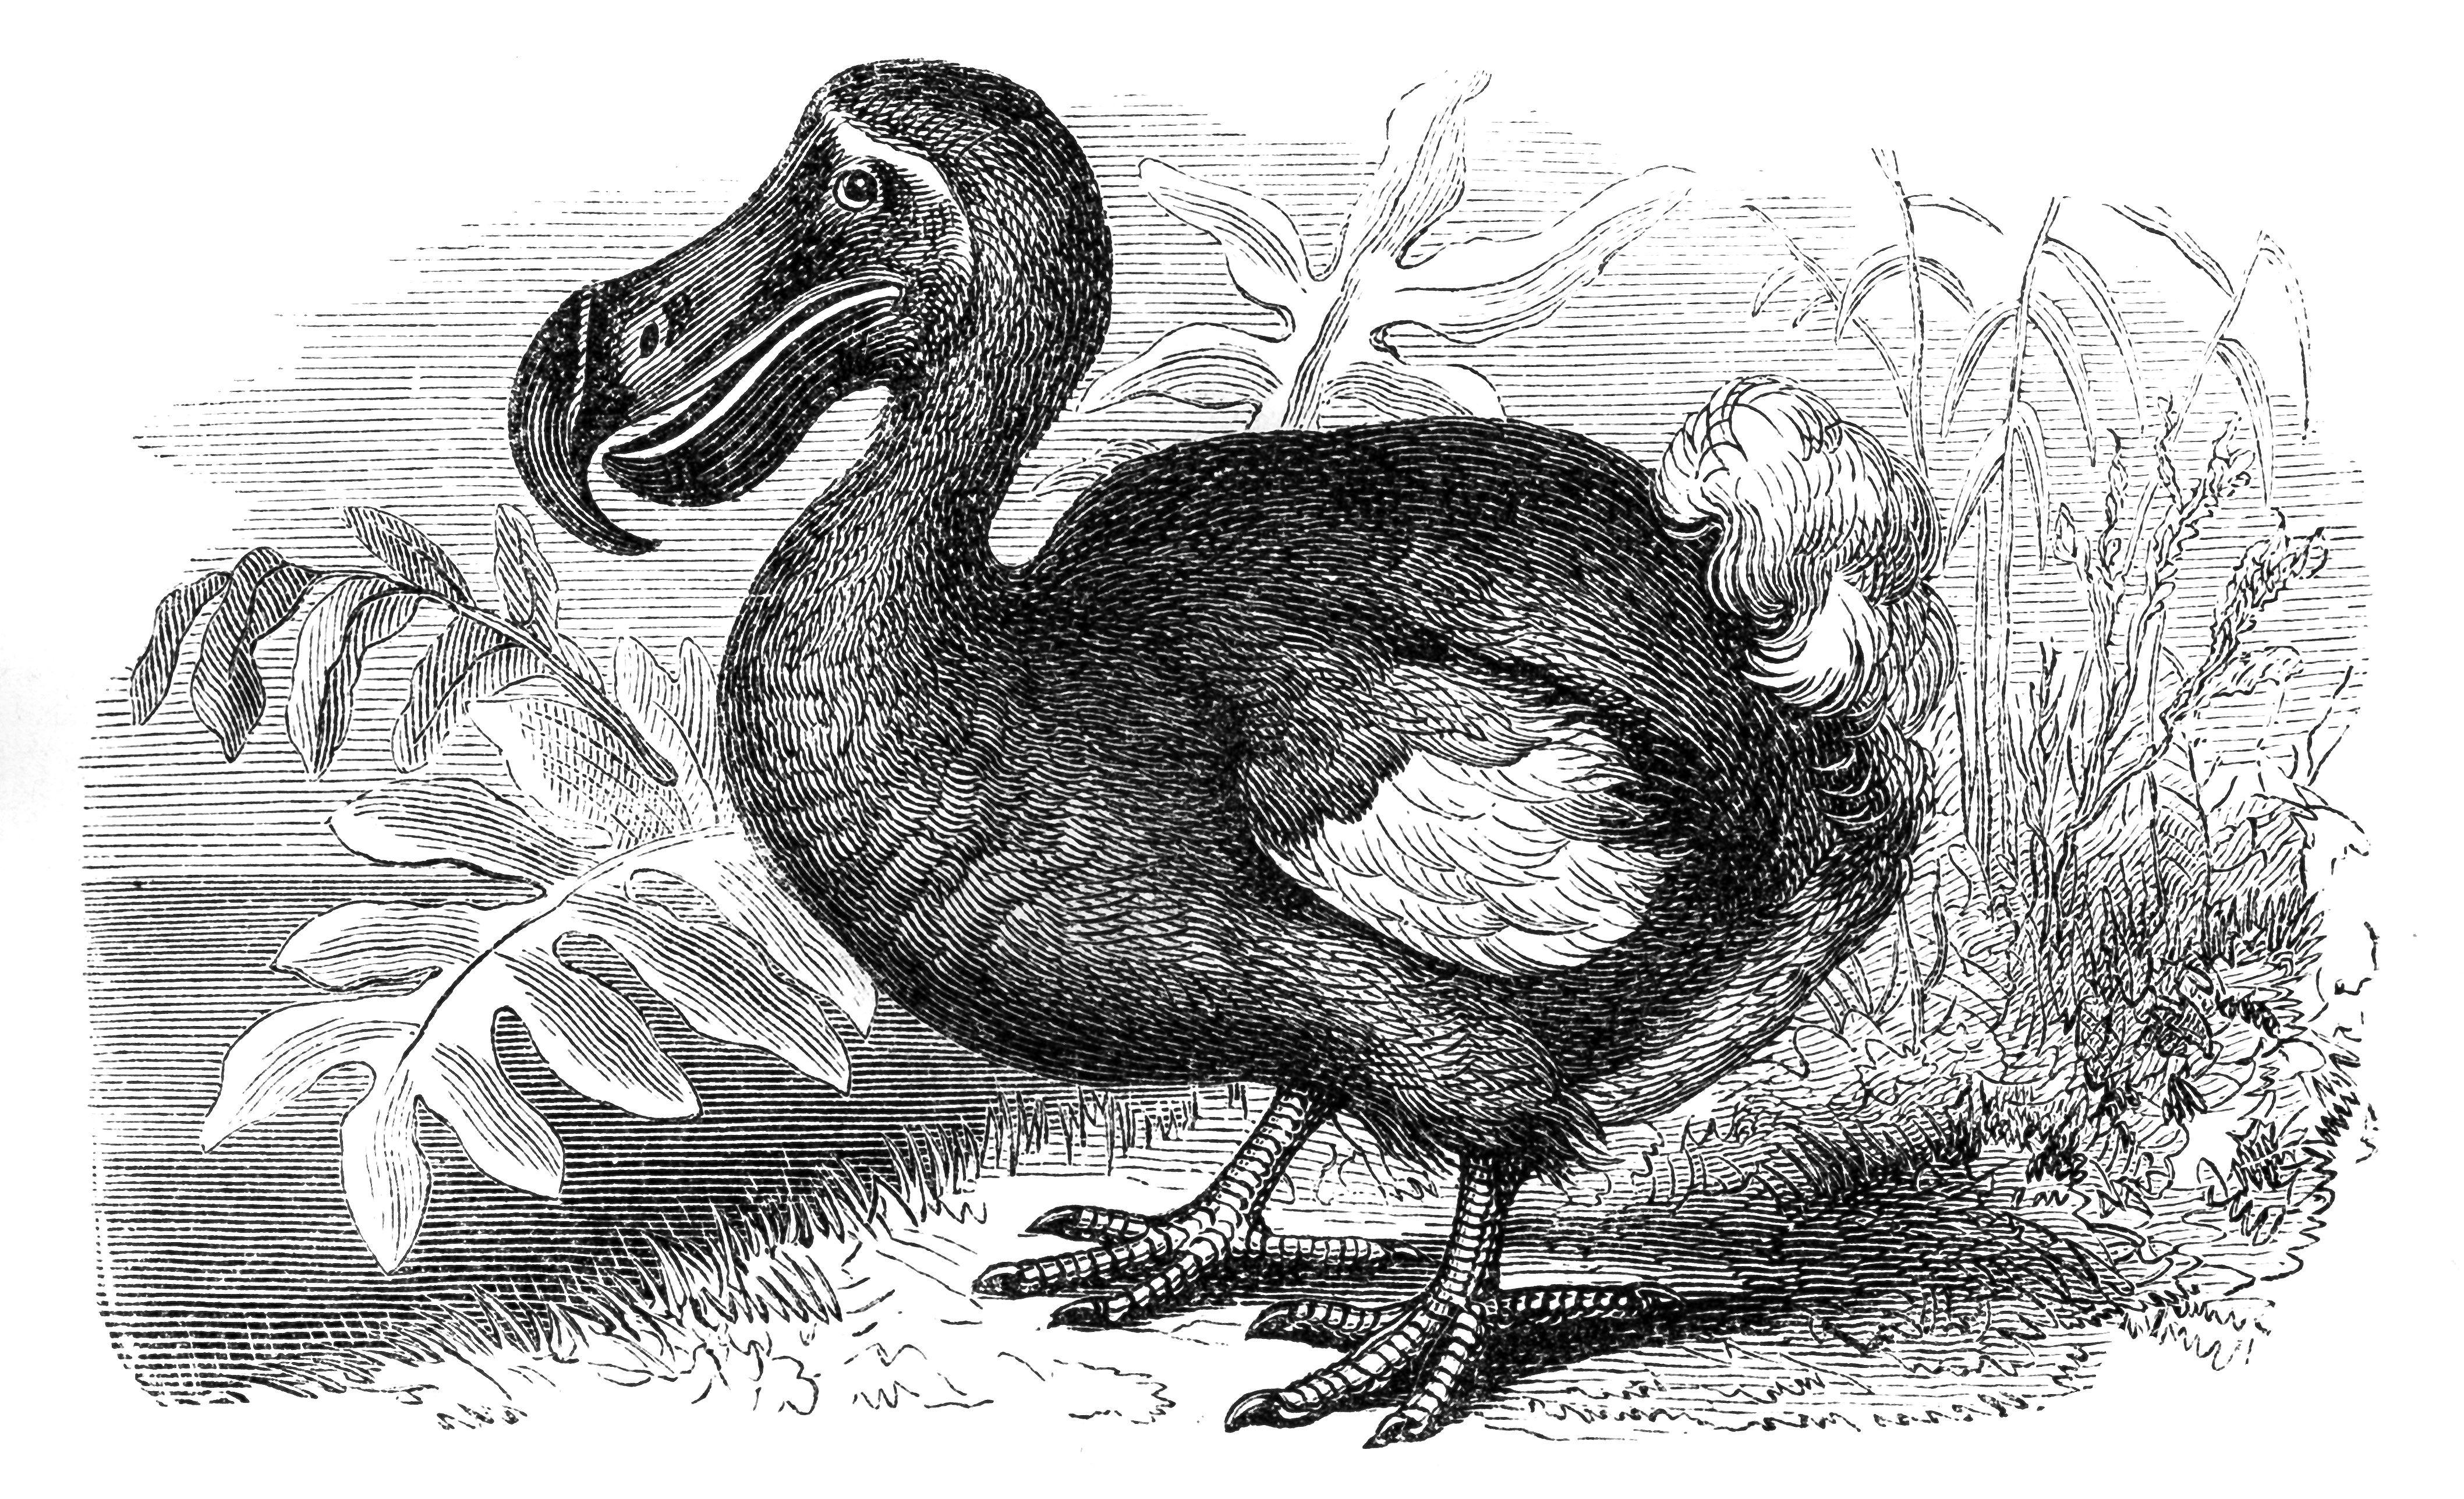 Dodo bird drawing